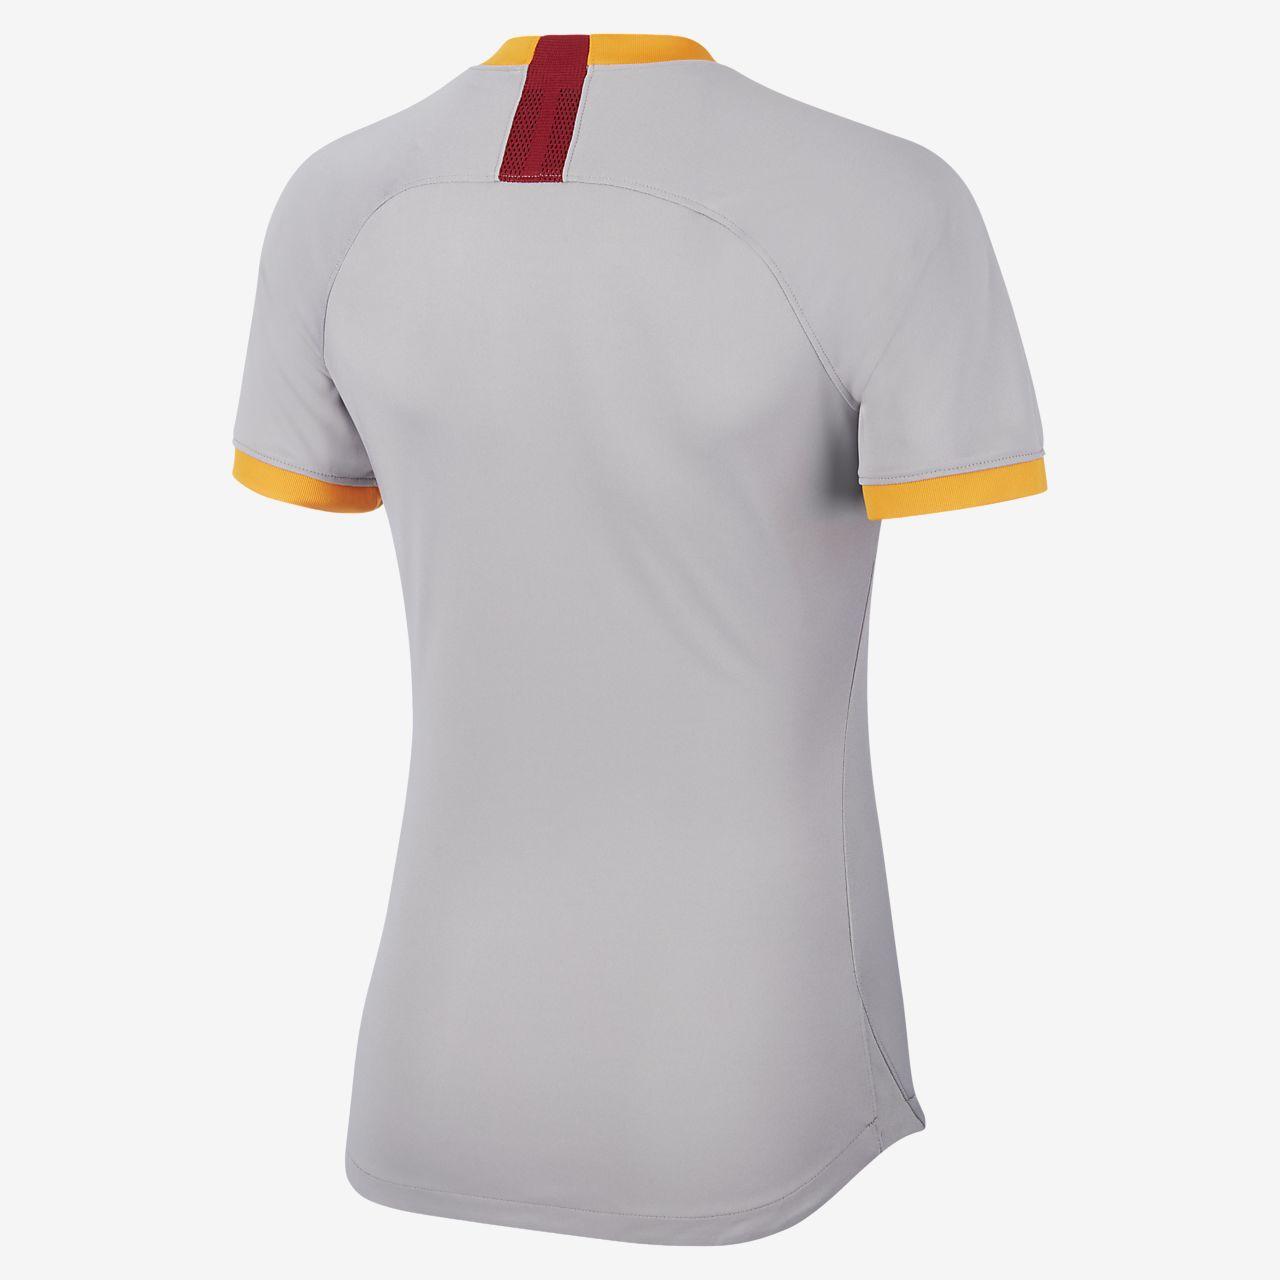 San Francisco elegir original selección mundial de Galatasaray 2019/20 Stadium Third Camiseta de fútbol - Mujer